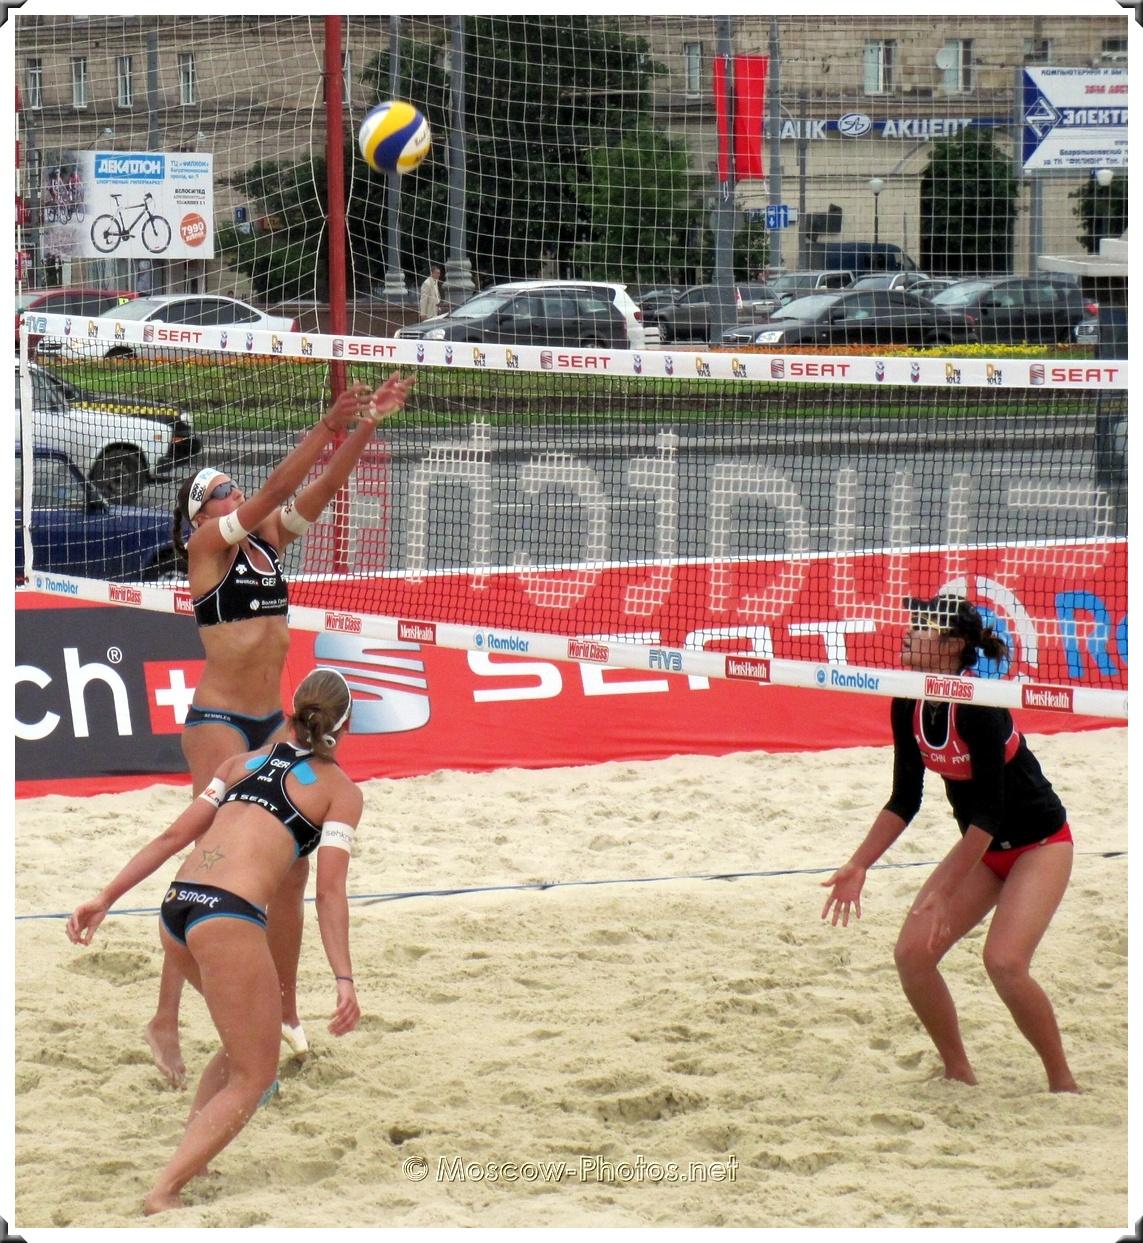 Beach Volleyball Swatch World Tour 2010